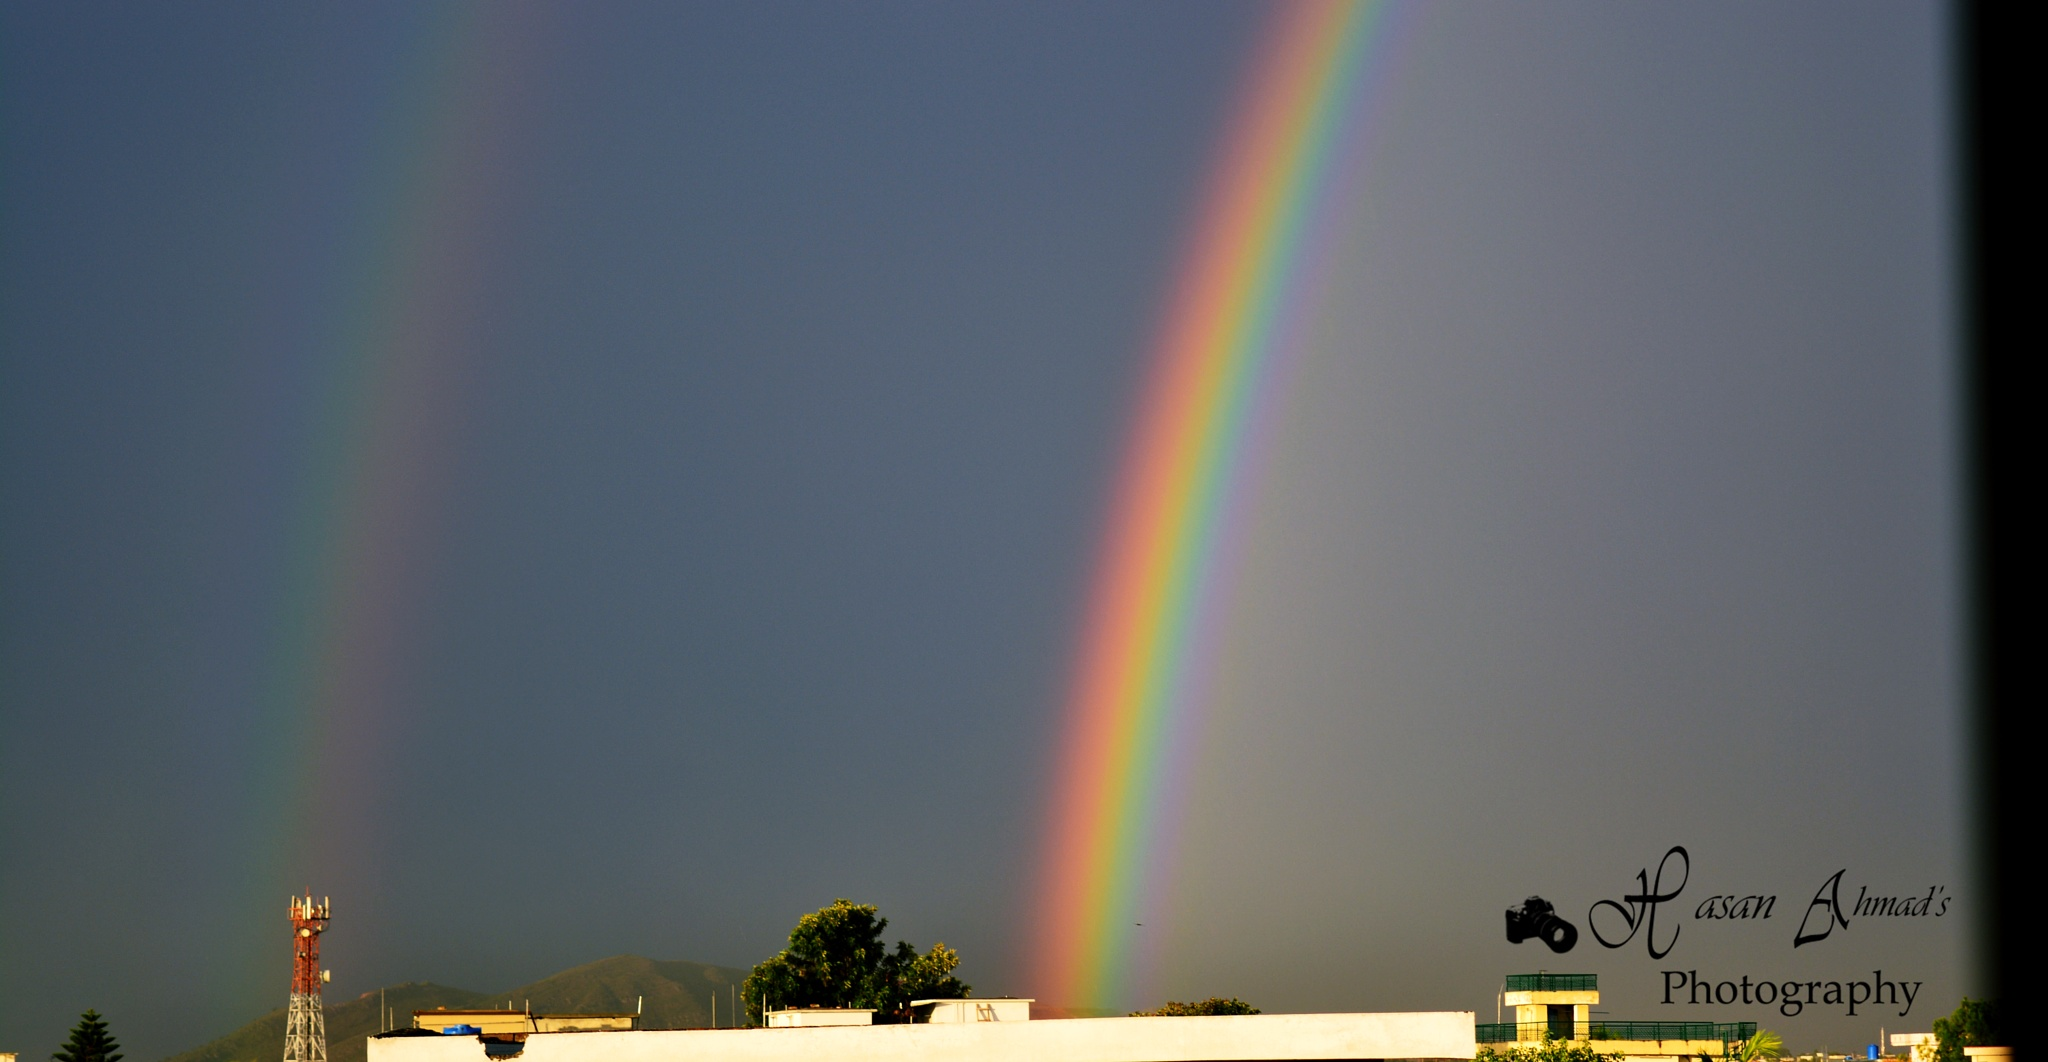 Rainbow by Hasan Ahmad